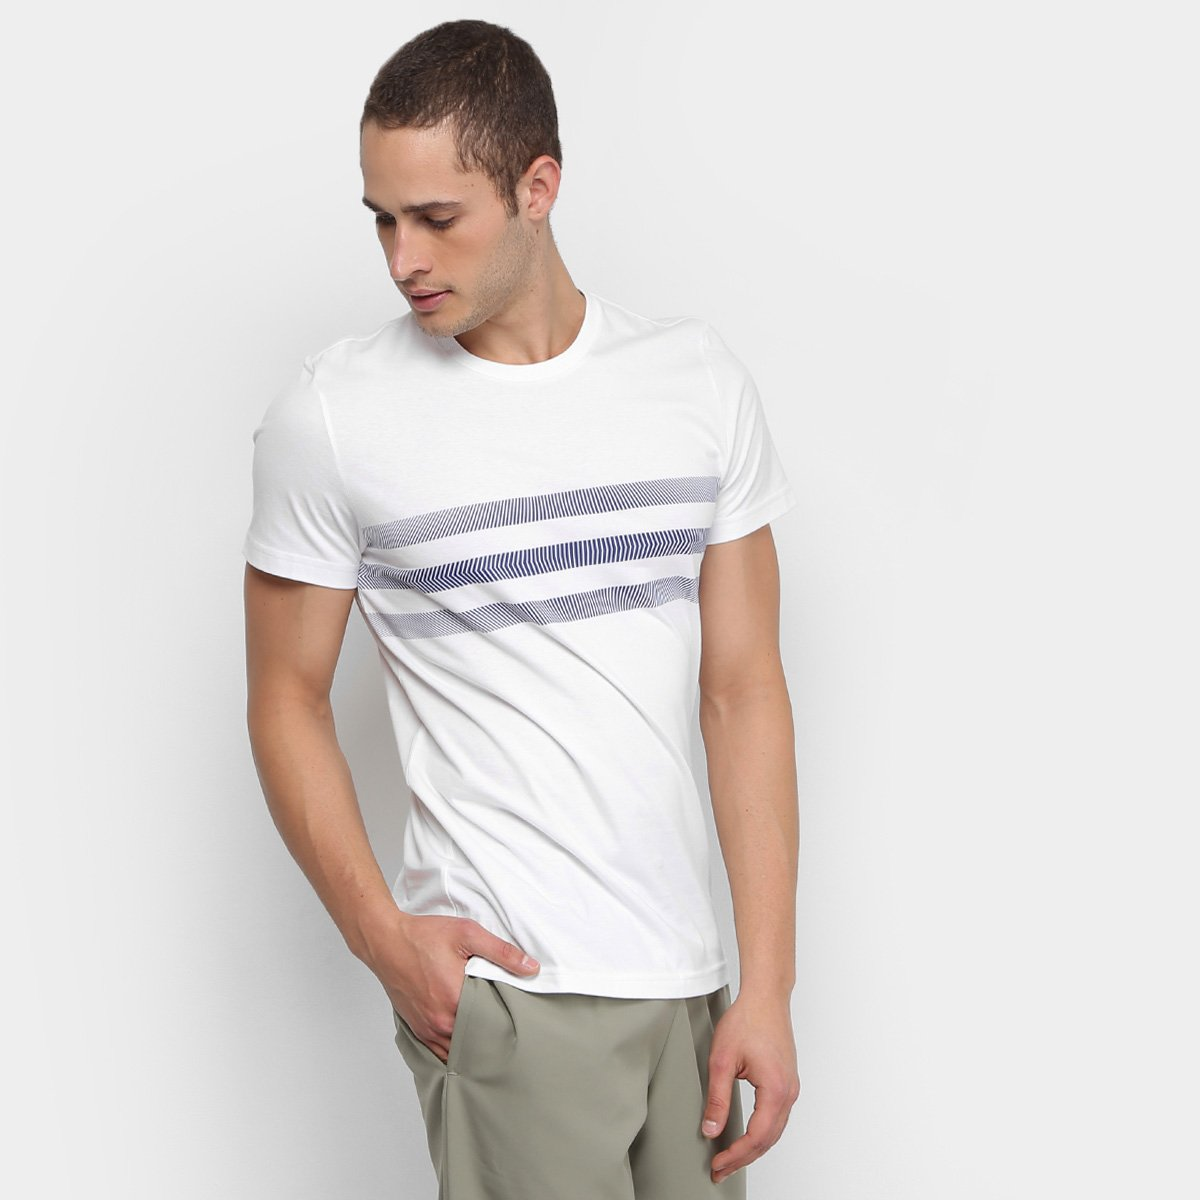 Camiseta Adidas Three Stripes Masculina - Compre Agora  e564135b7c7